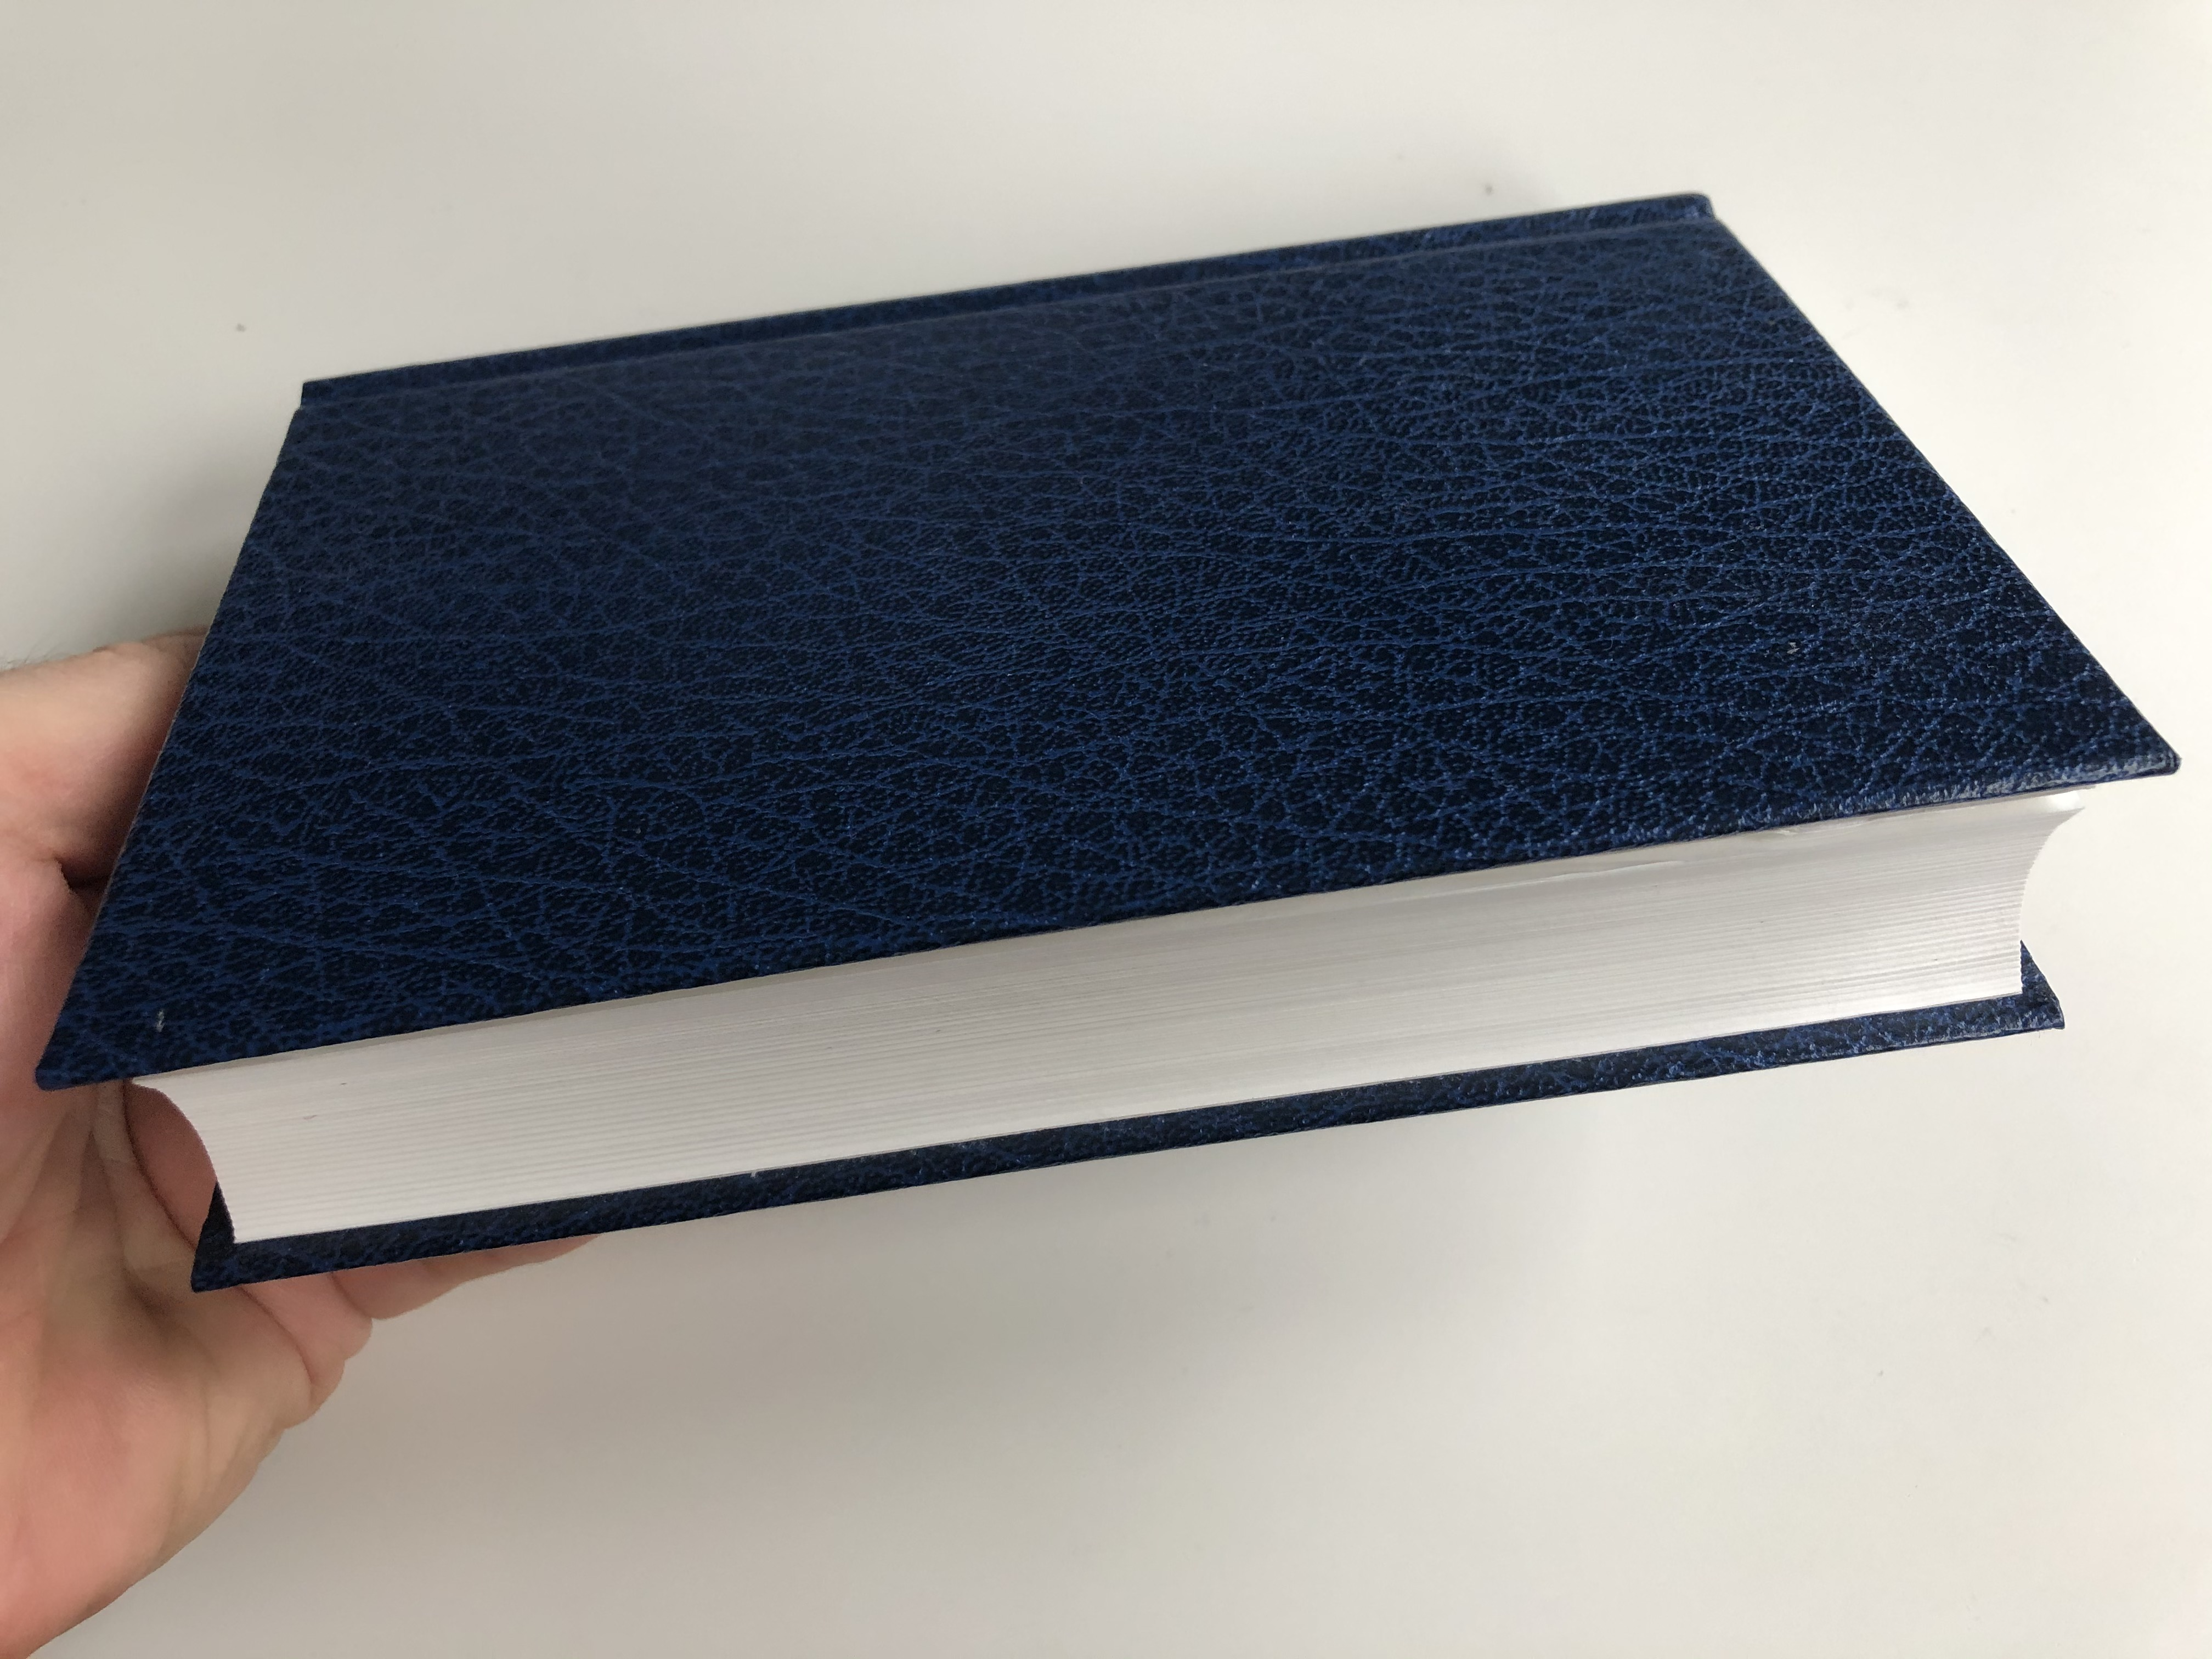 serbian-bible-sveto-pismo-biblija-043-blue-hardcover-4.jpg